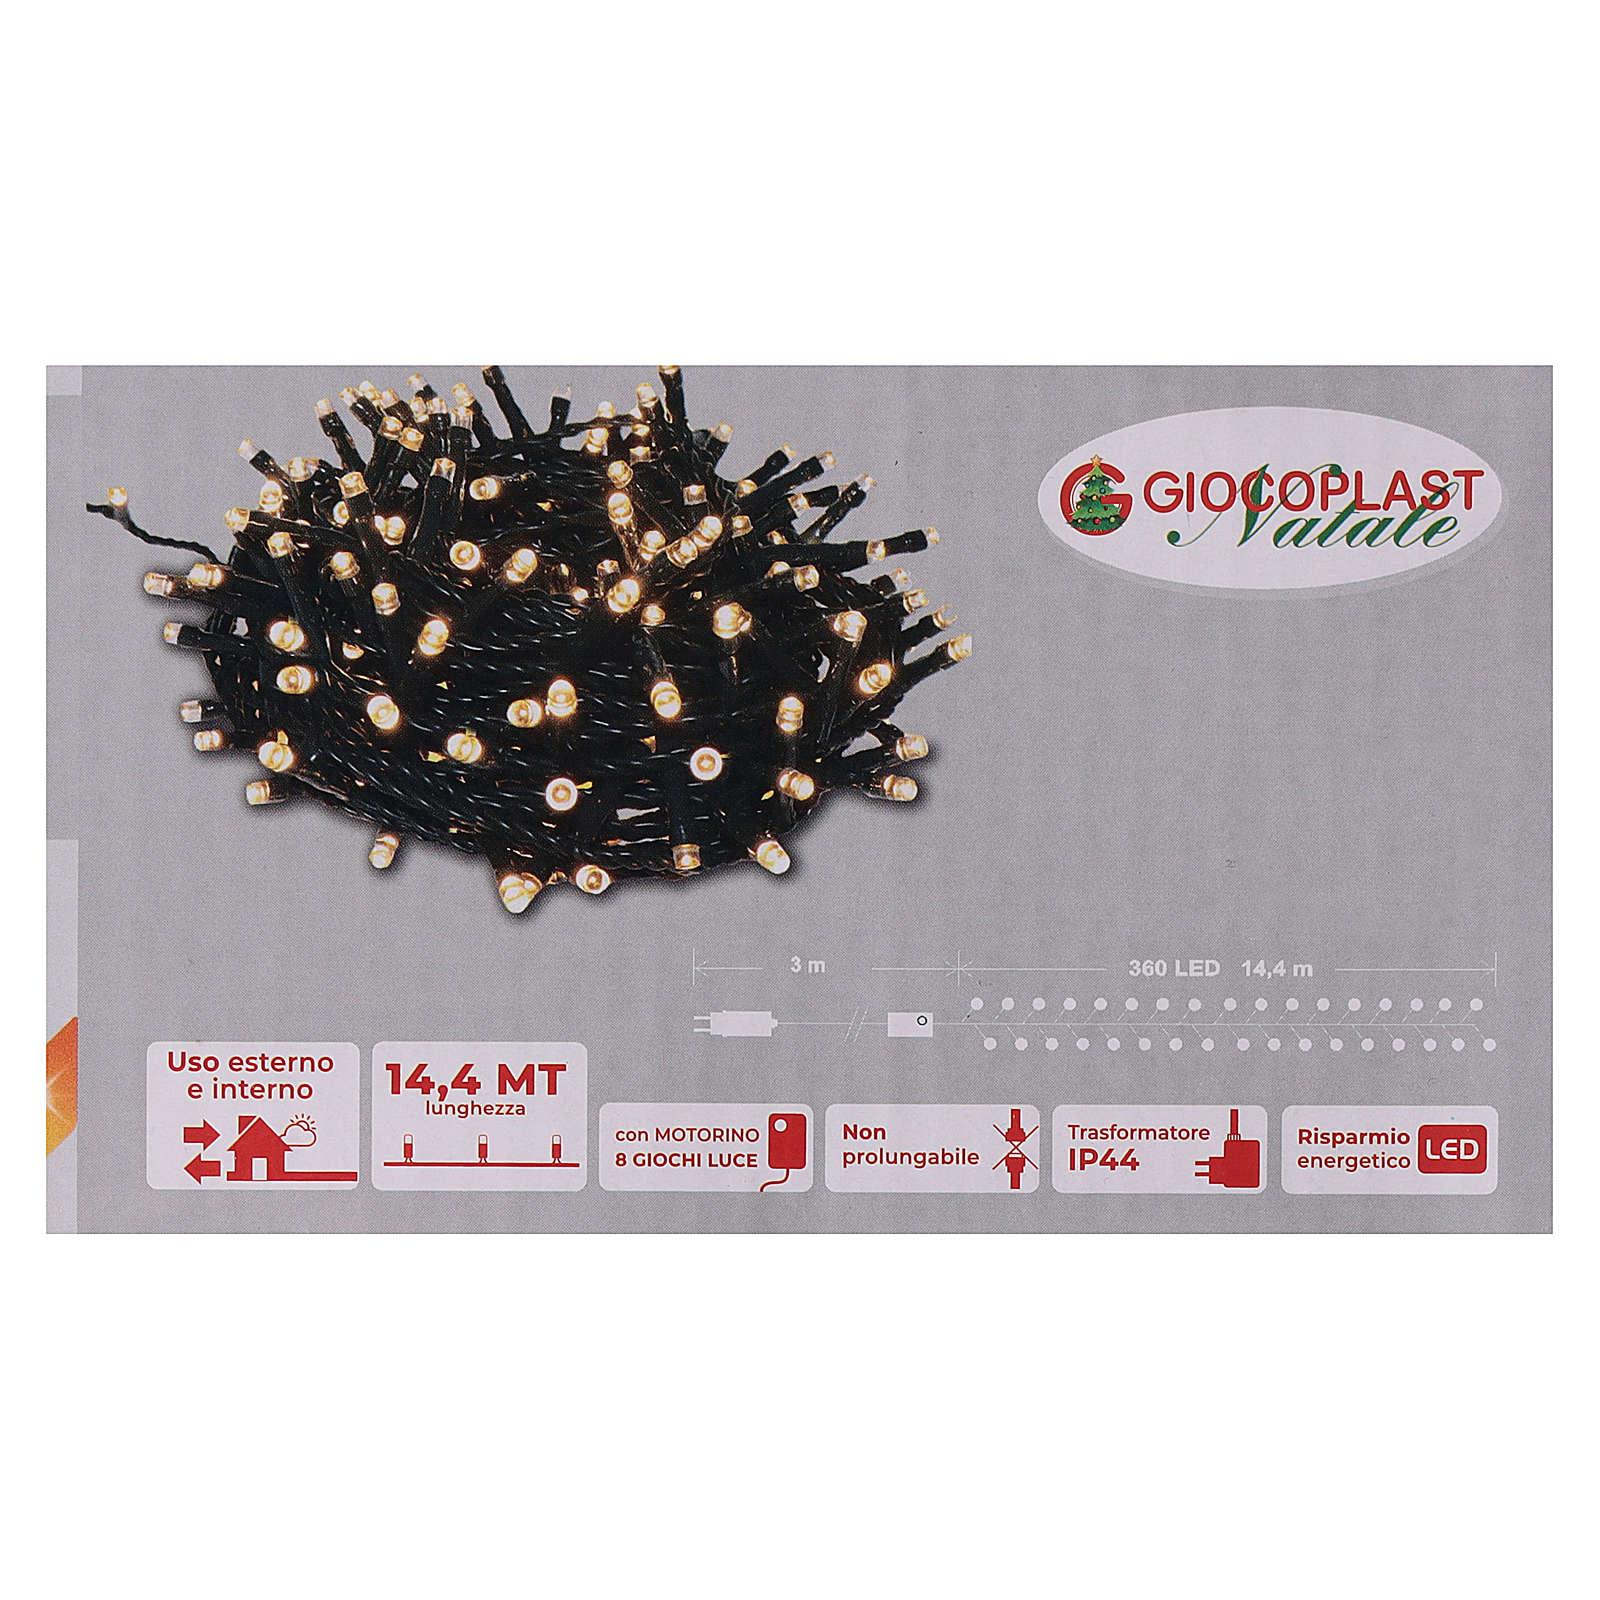 Grinalda 360 LED branco quente 3